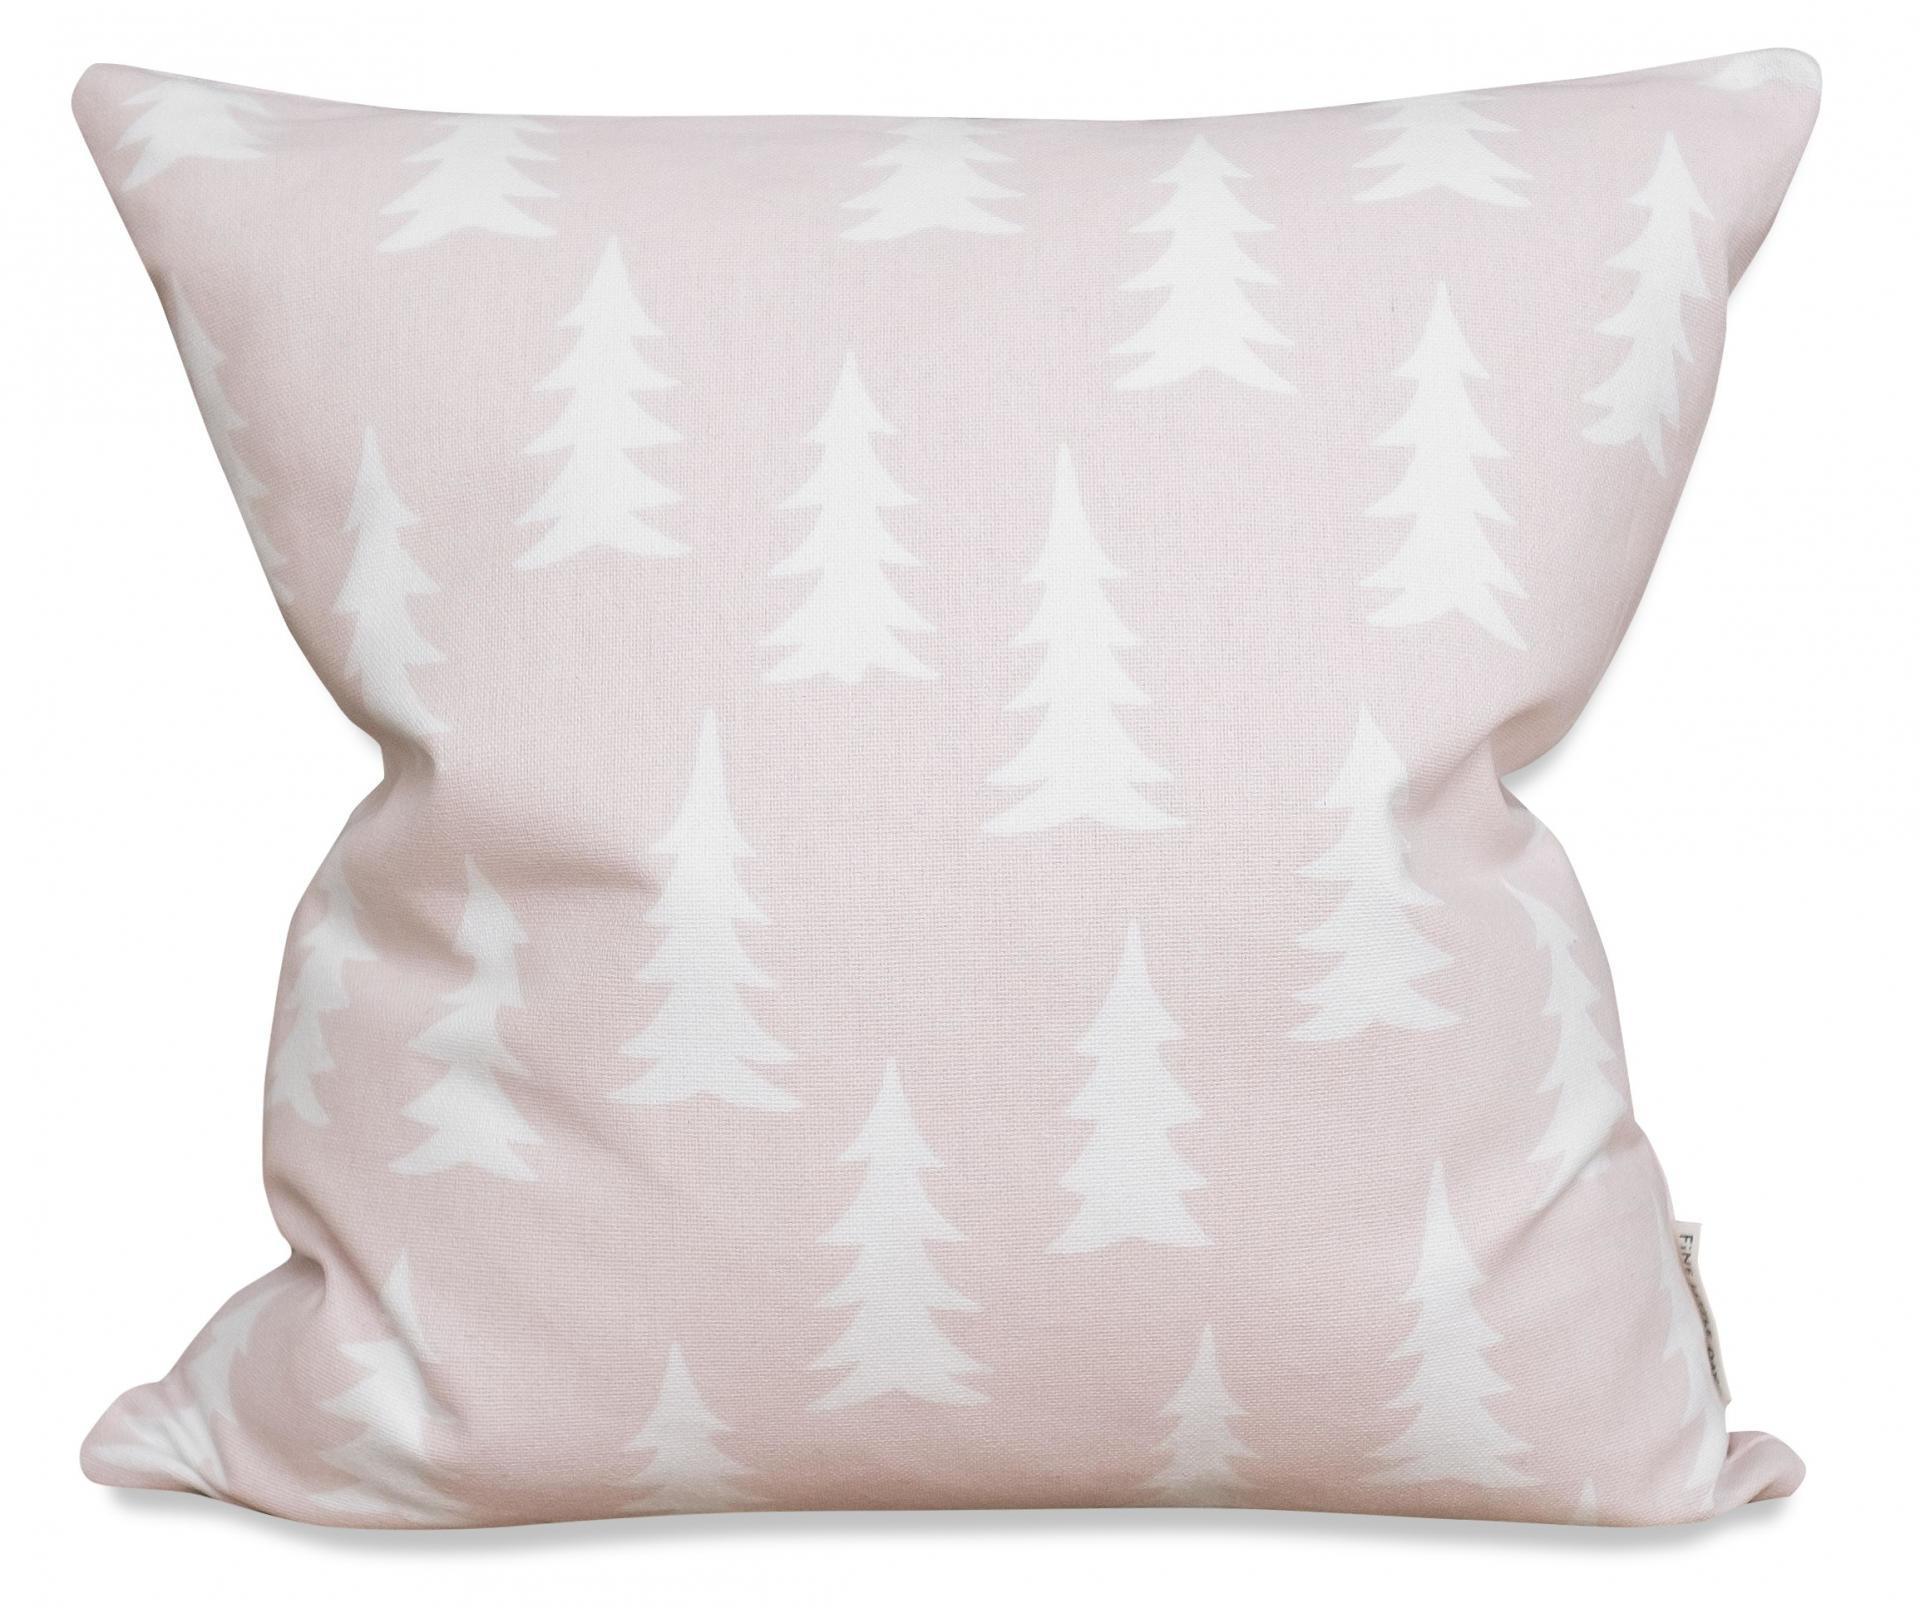 Fine Little Day Povlak na polštář Gran Powder 50x50 cm, růžová barva, textil